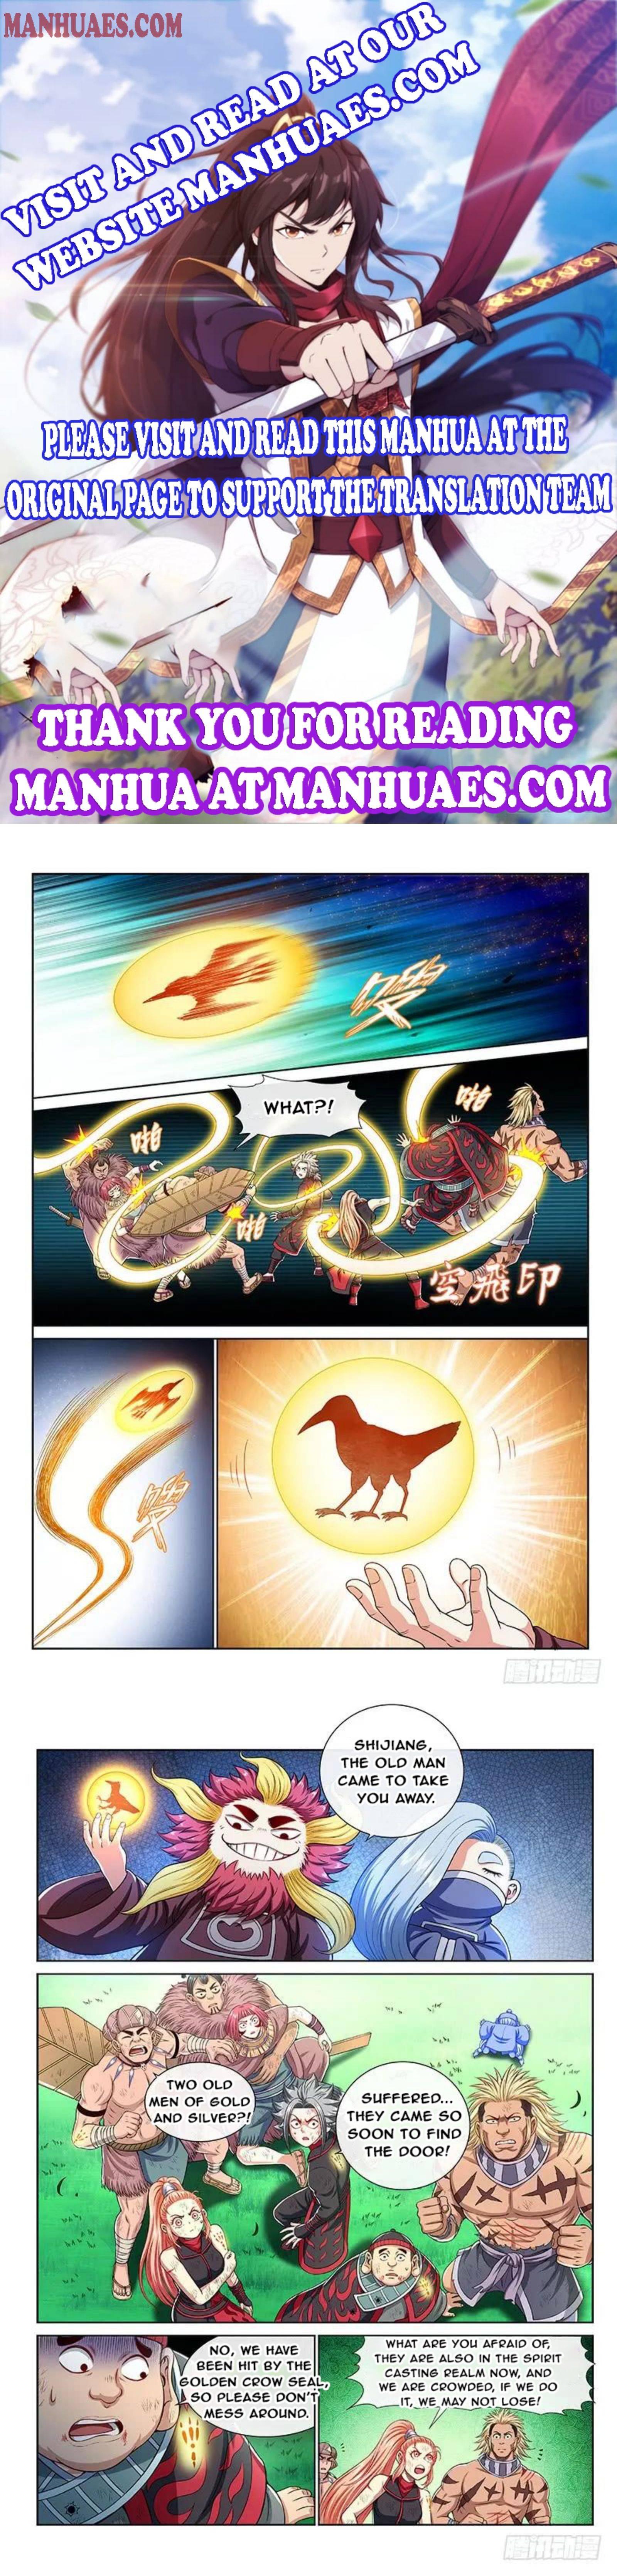 https://manga.mangadogs.com/comics/pic4/4/21124/3266241/8f0f26049794f5f9e6d3387c8a280dff.jpg Page 1